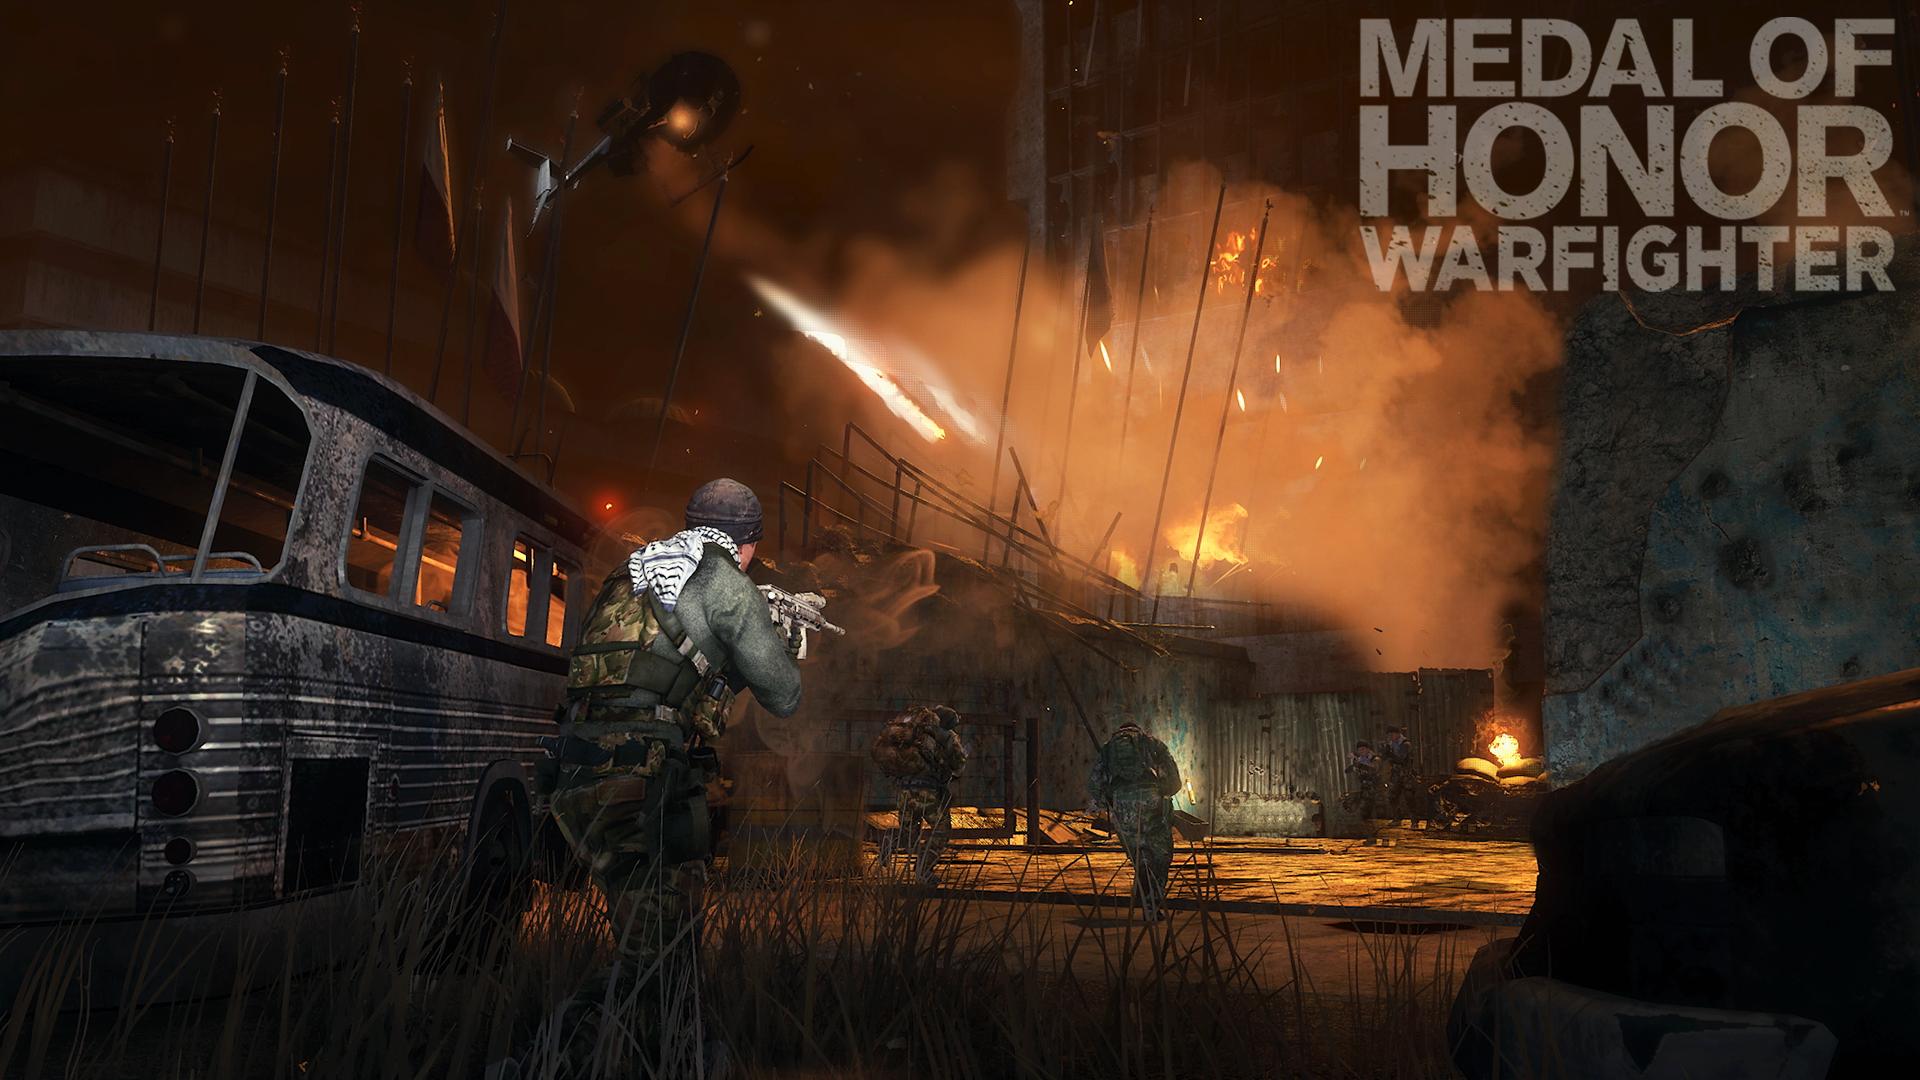 Medal of Honor: Warfighter. Рецензия.. - Изображение 2